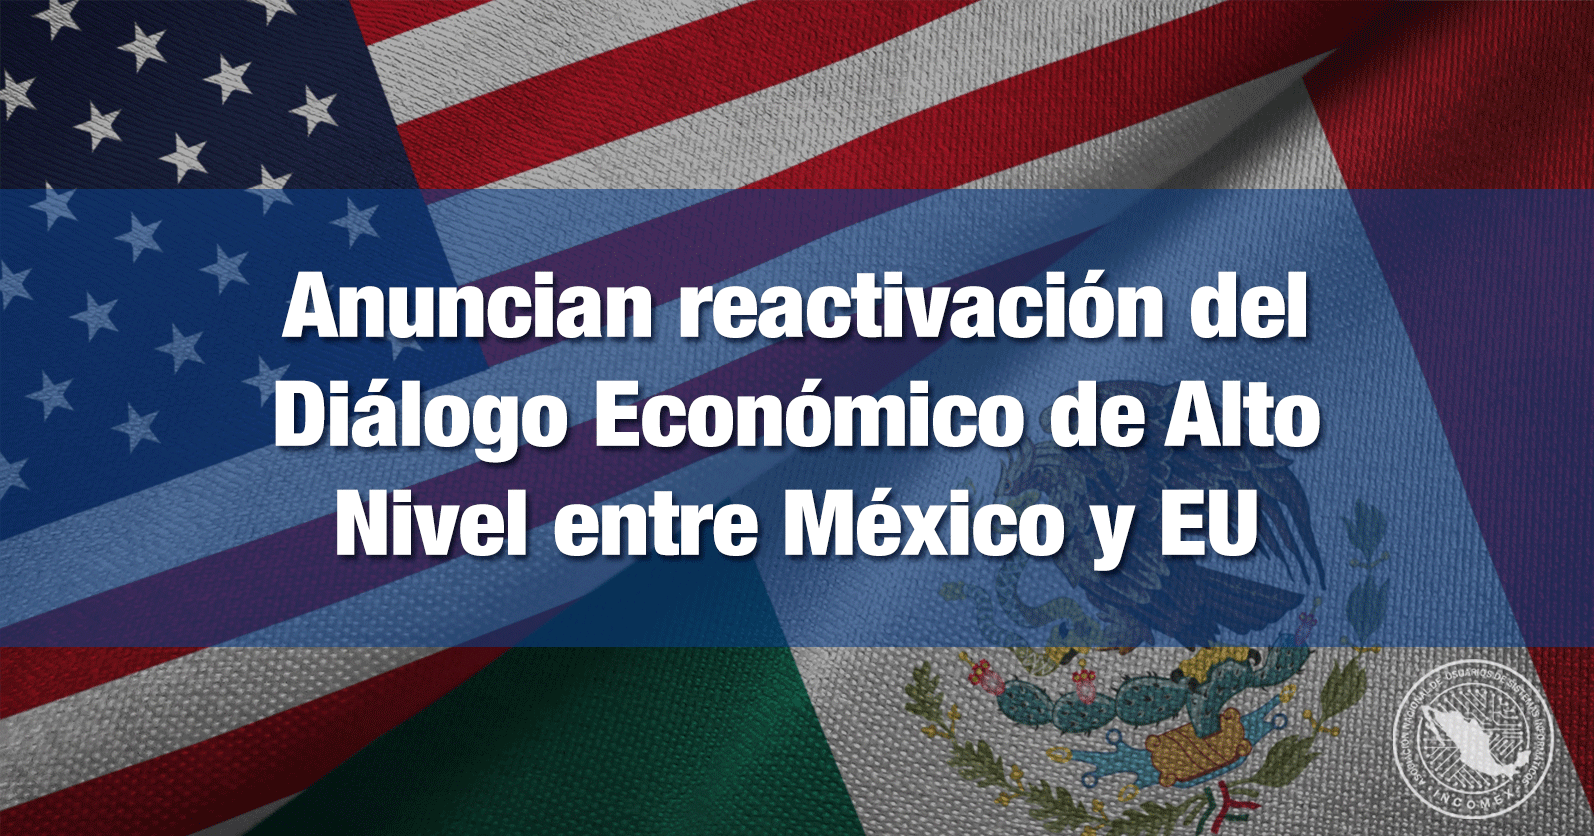 Anuncian reactivación del Diálogo Económico de Alto Nivel entre México y EU